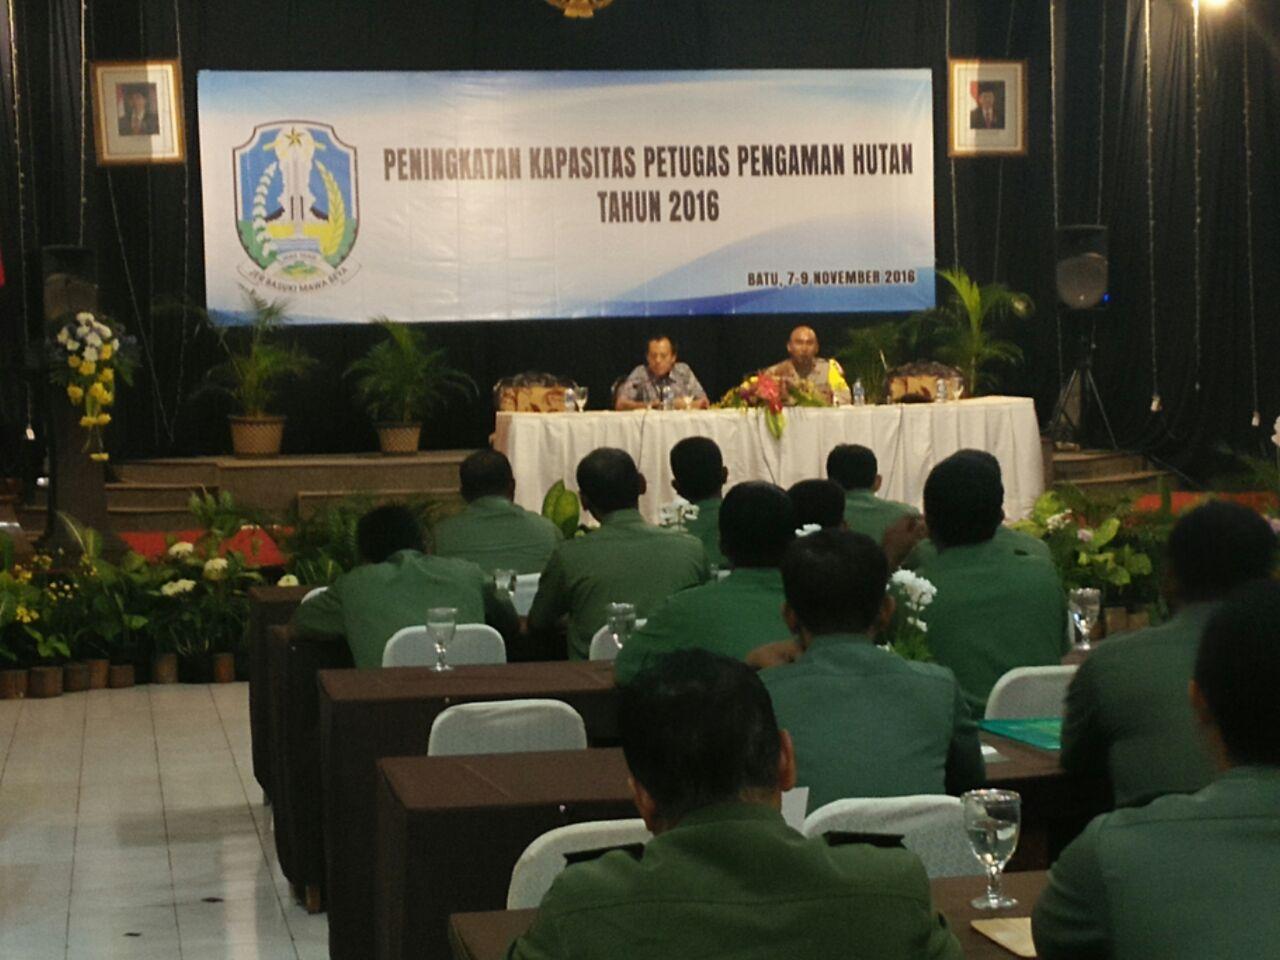 Kasat Shabara Polres Batu Bersinergi bersama Dinas Kehutanan Provinsi Jawa Timur